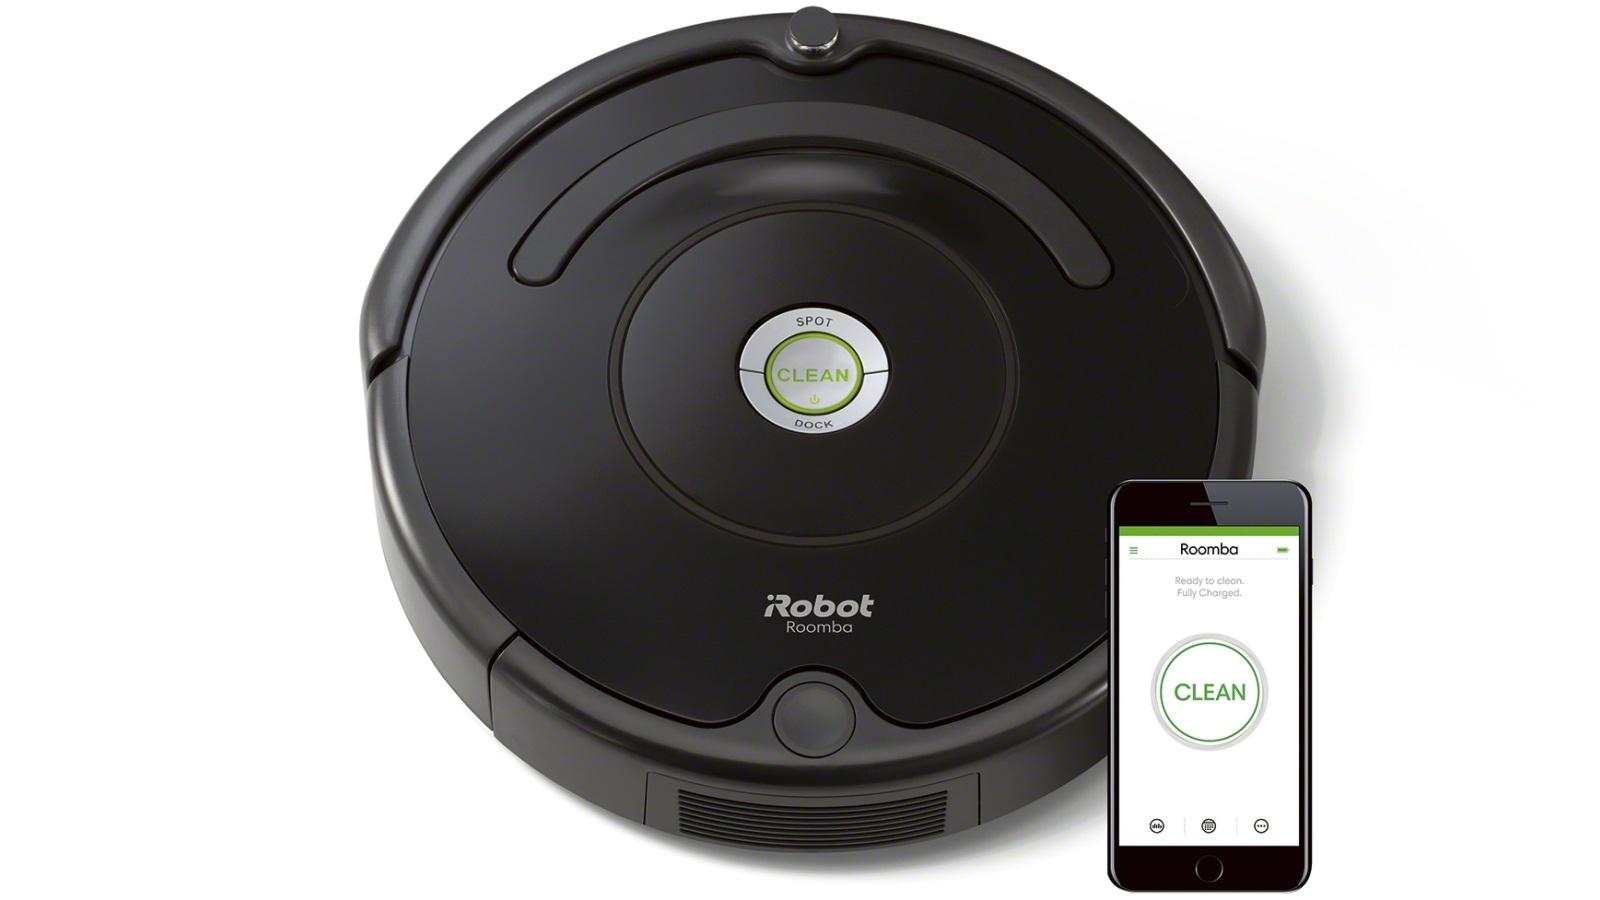 iRobot Roomba 670 Robotic Vacuum Cleaner